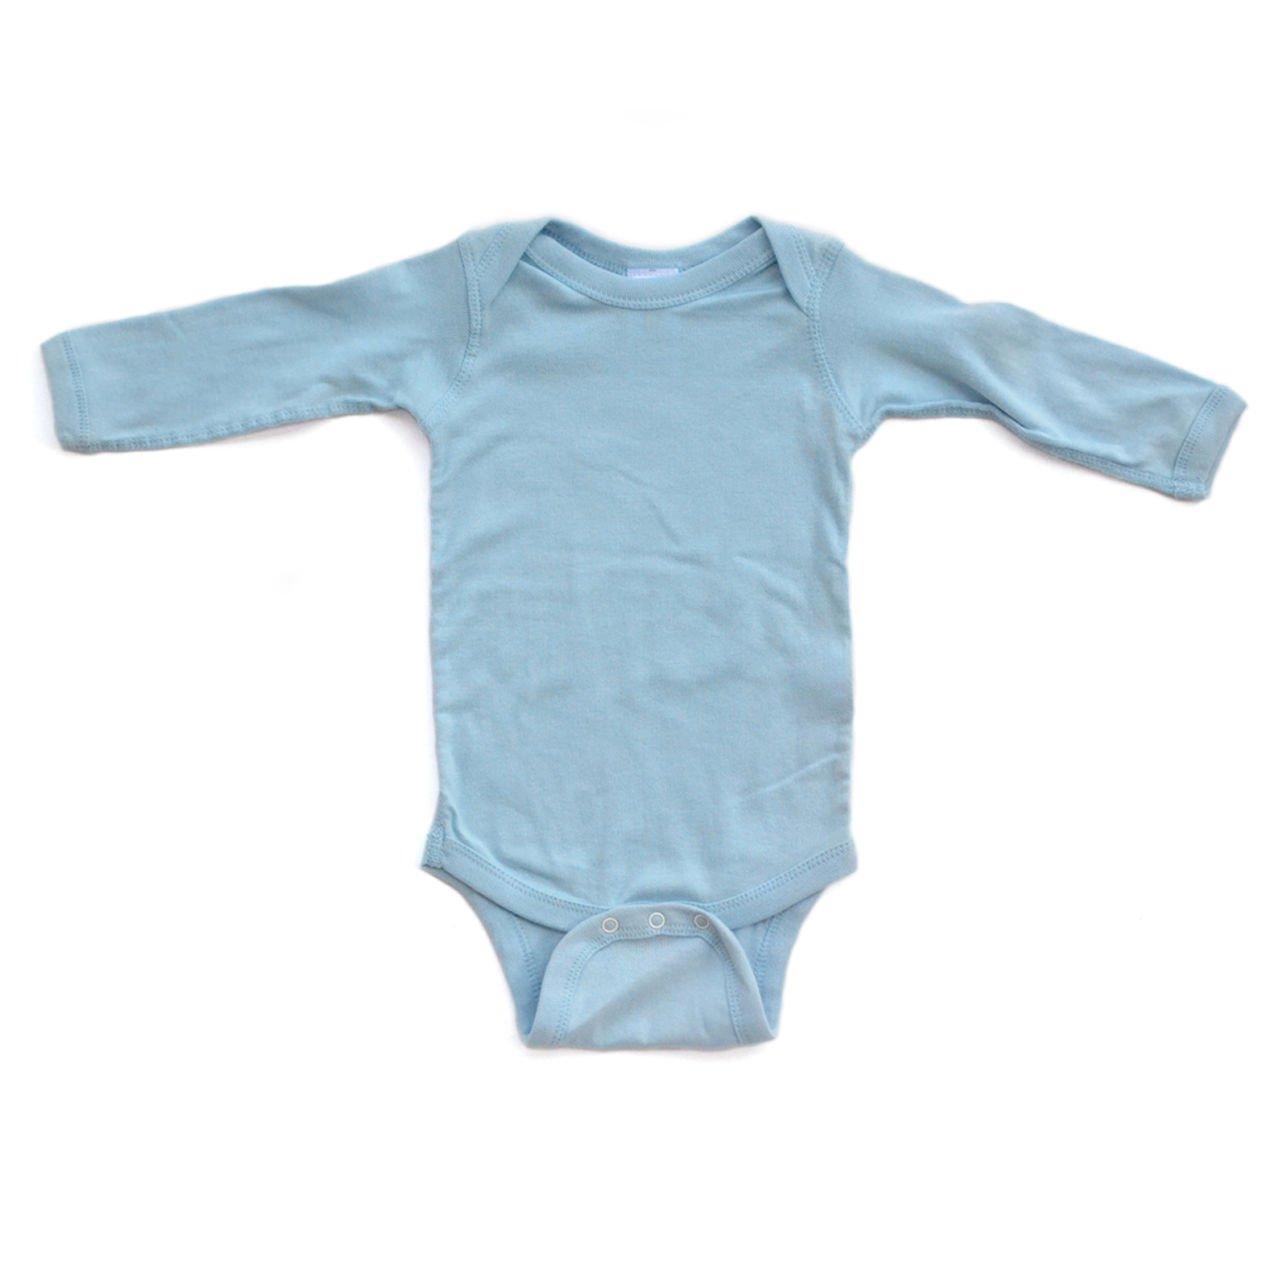 Apericots Plain Blank Ultra Soft Cotton Long Sleeve Baby Infant Bodysuit